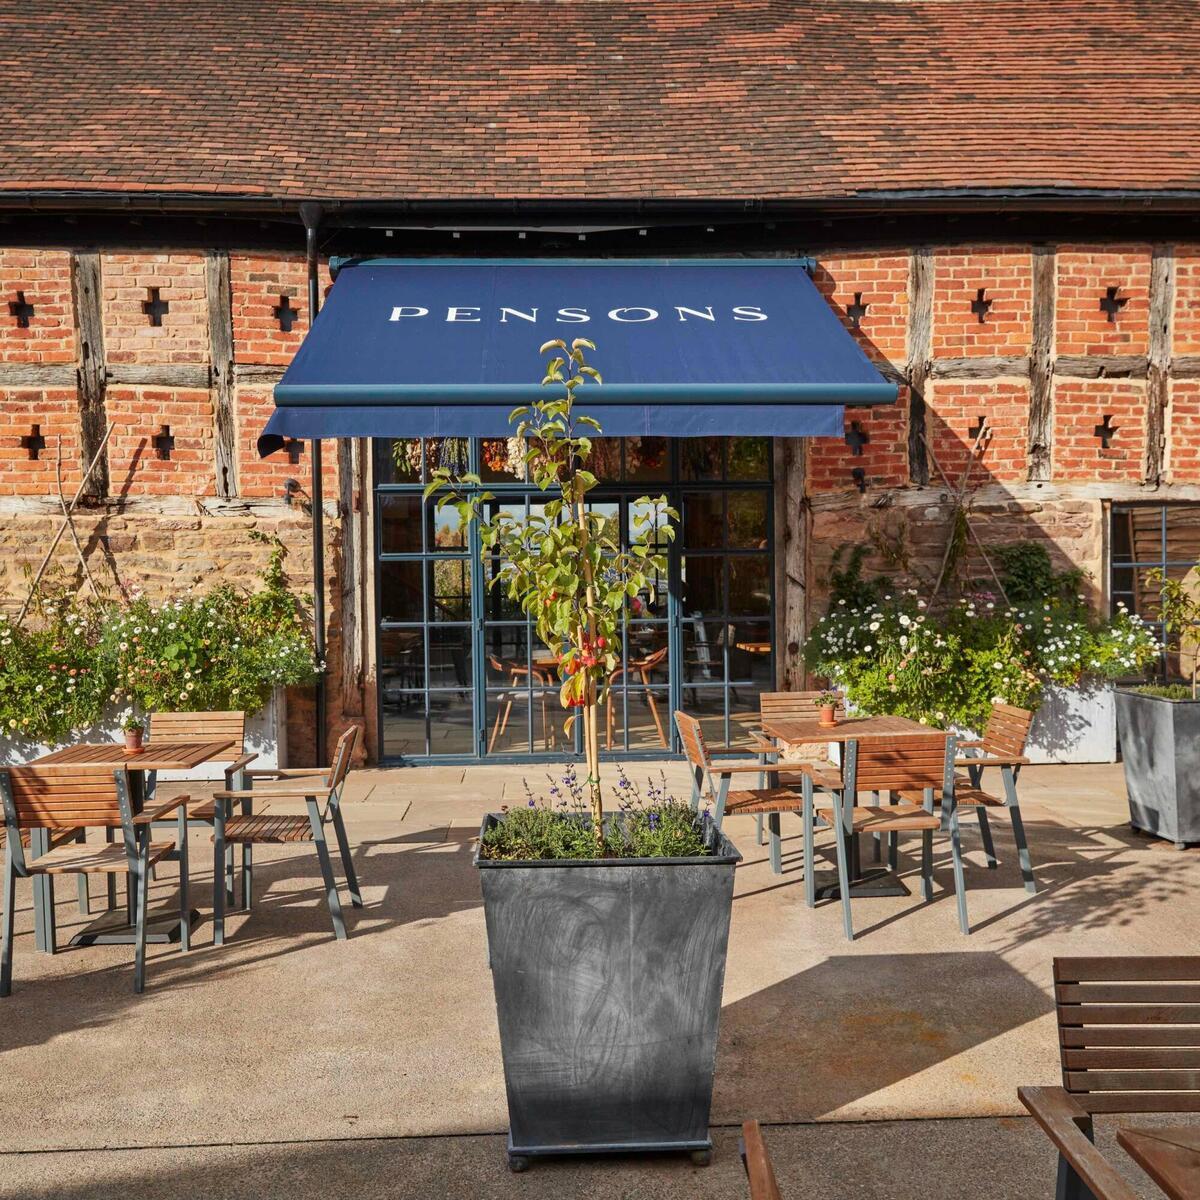 Pensons Restaurant Courtyard by Jodi Hinds